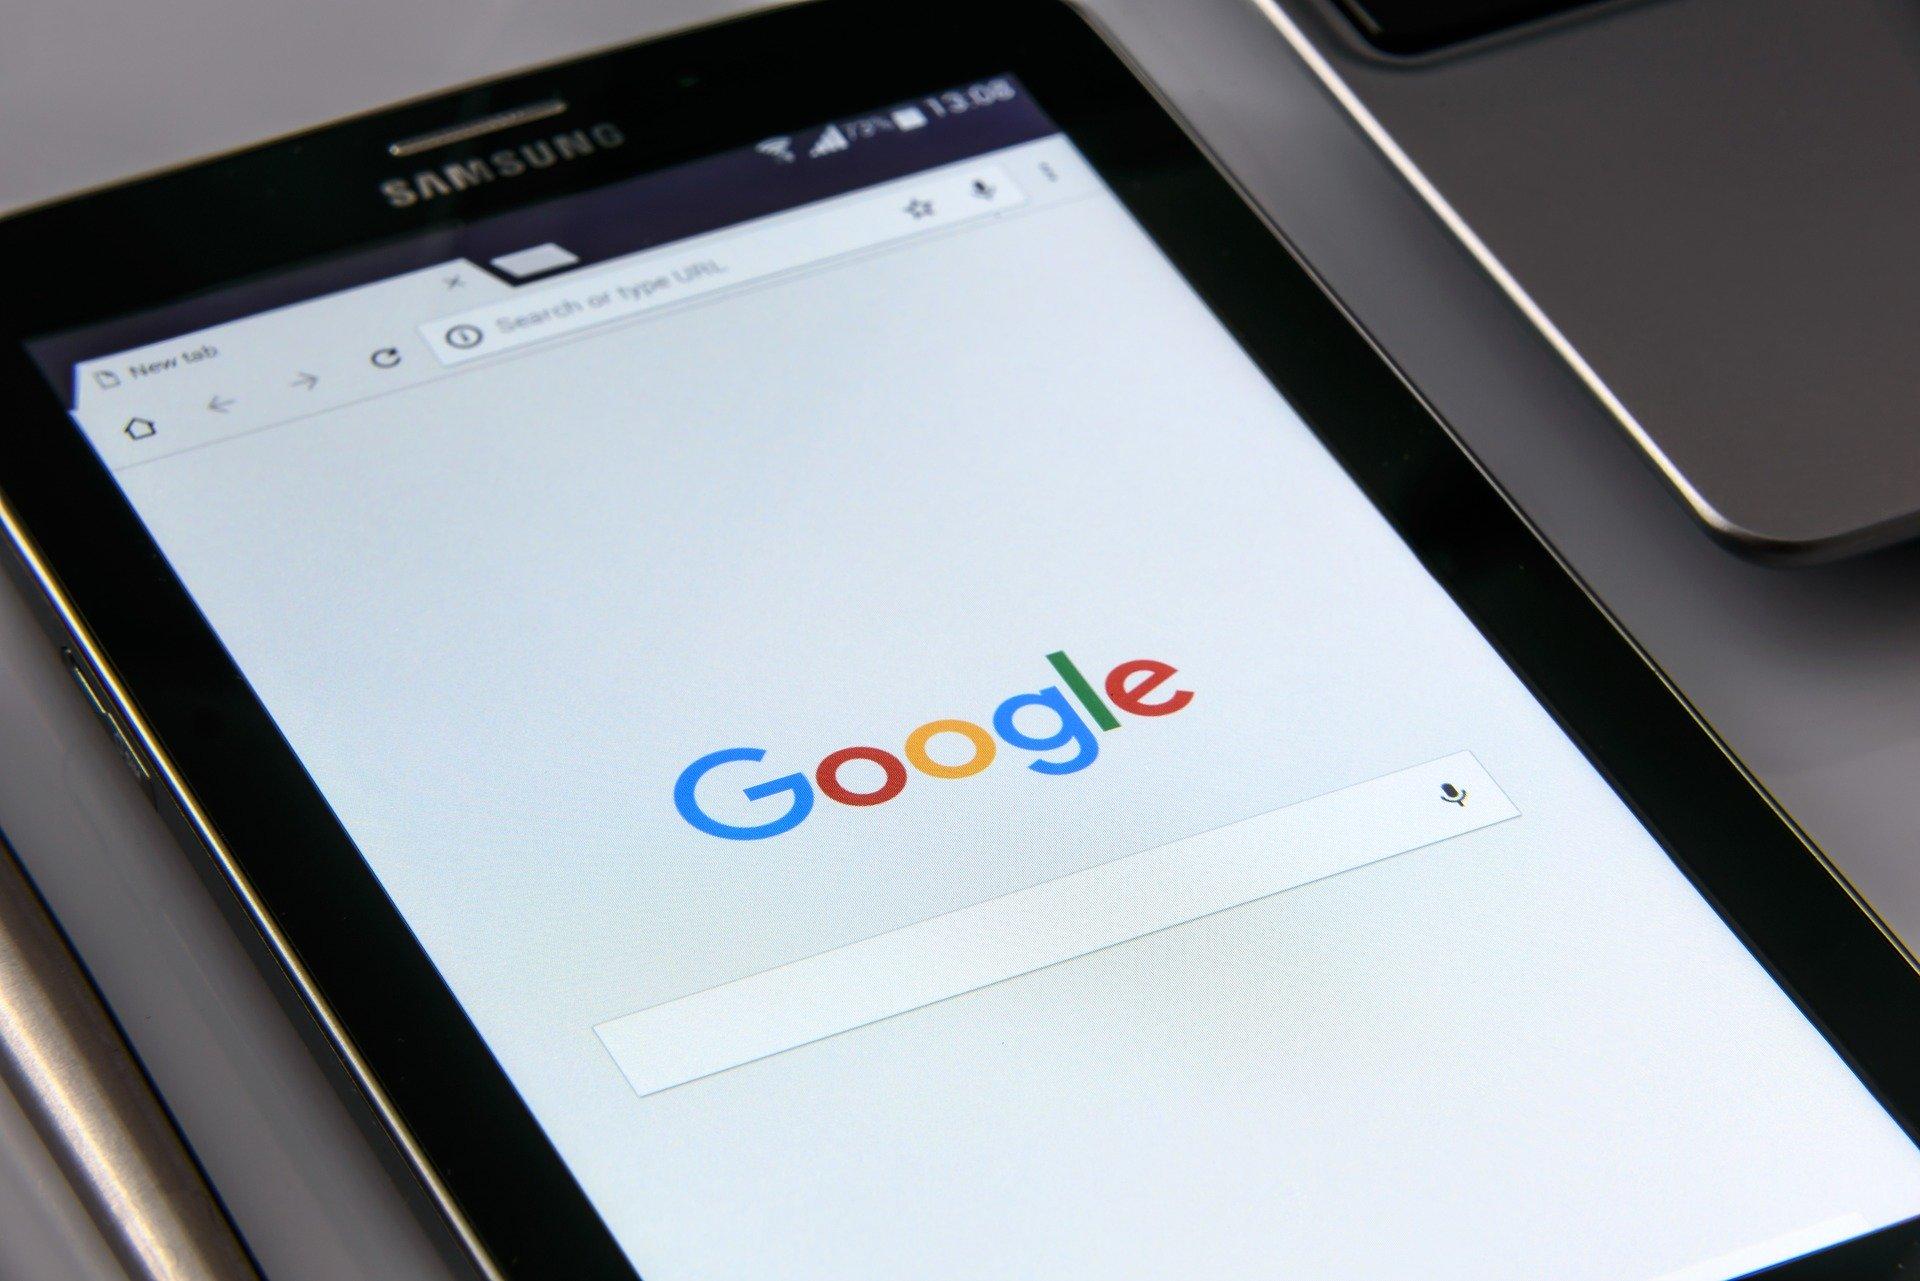 Sonos sues Google for patent infringement